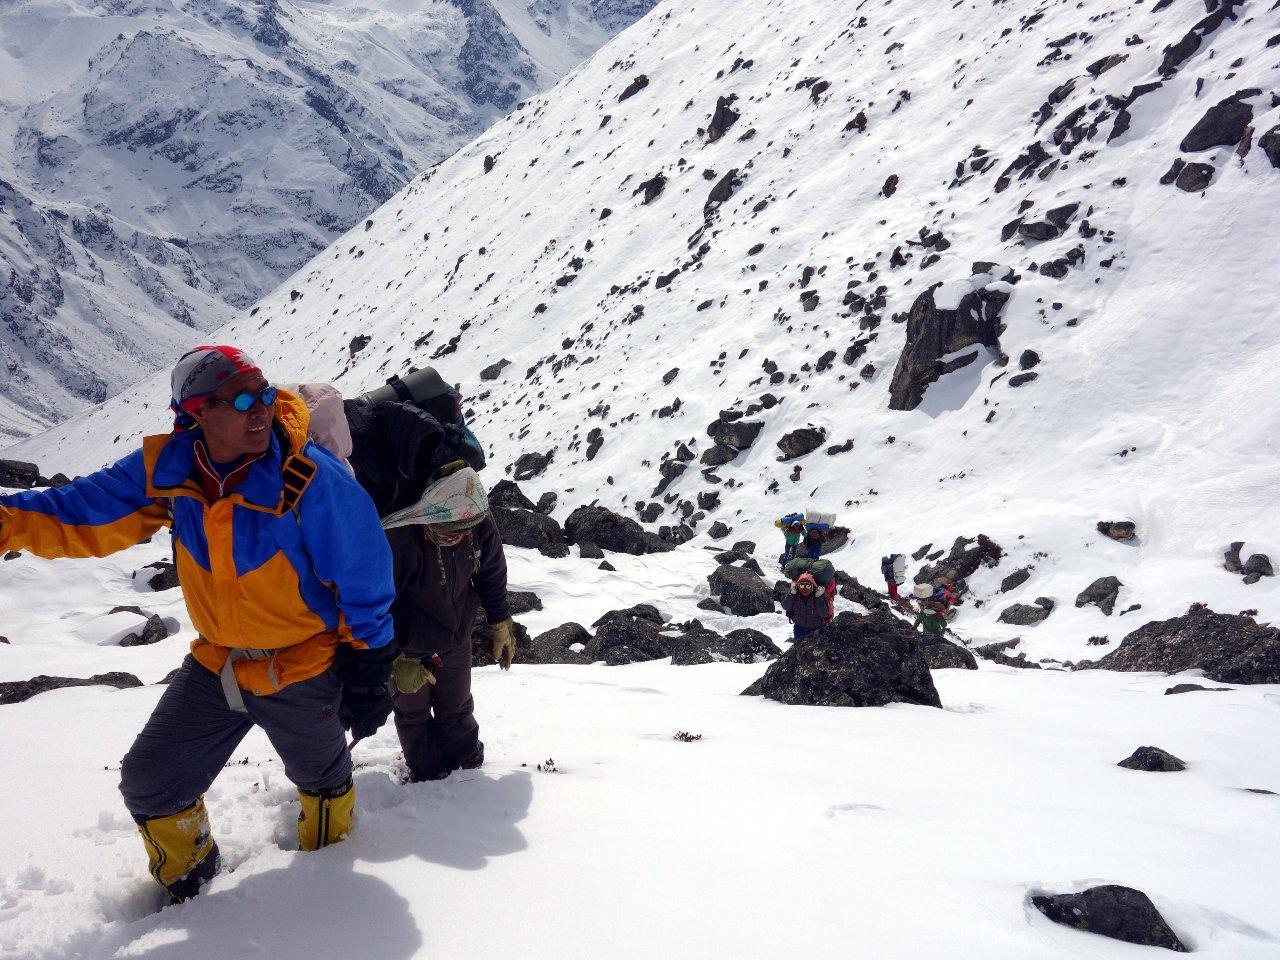 Trail breaking through deep snow on the way to Yala Peak base camp